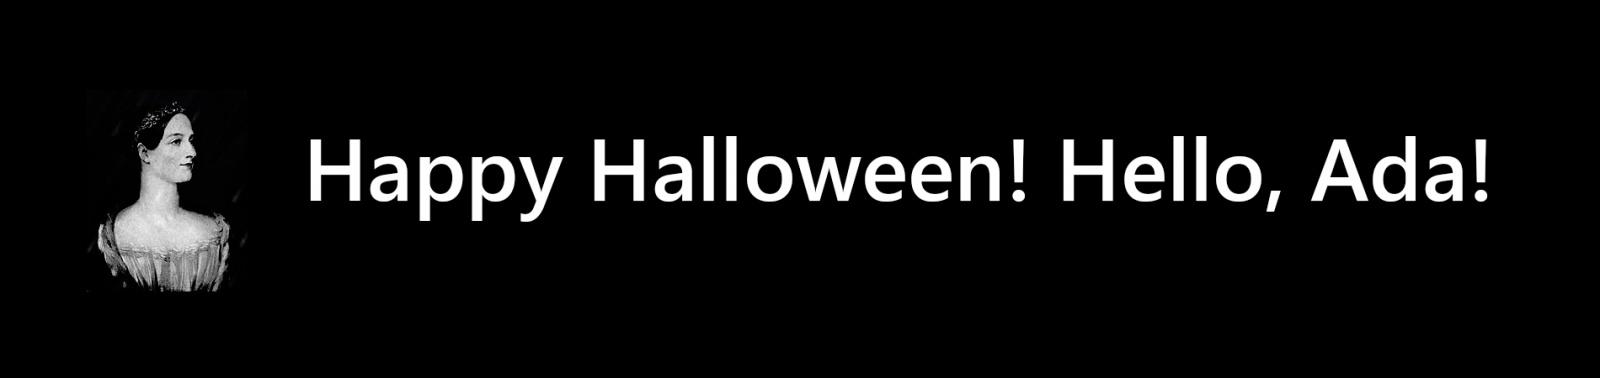 Happy Halloween! Hello, Ada - 1